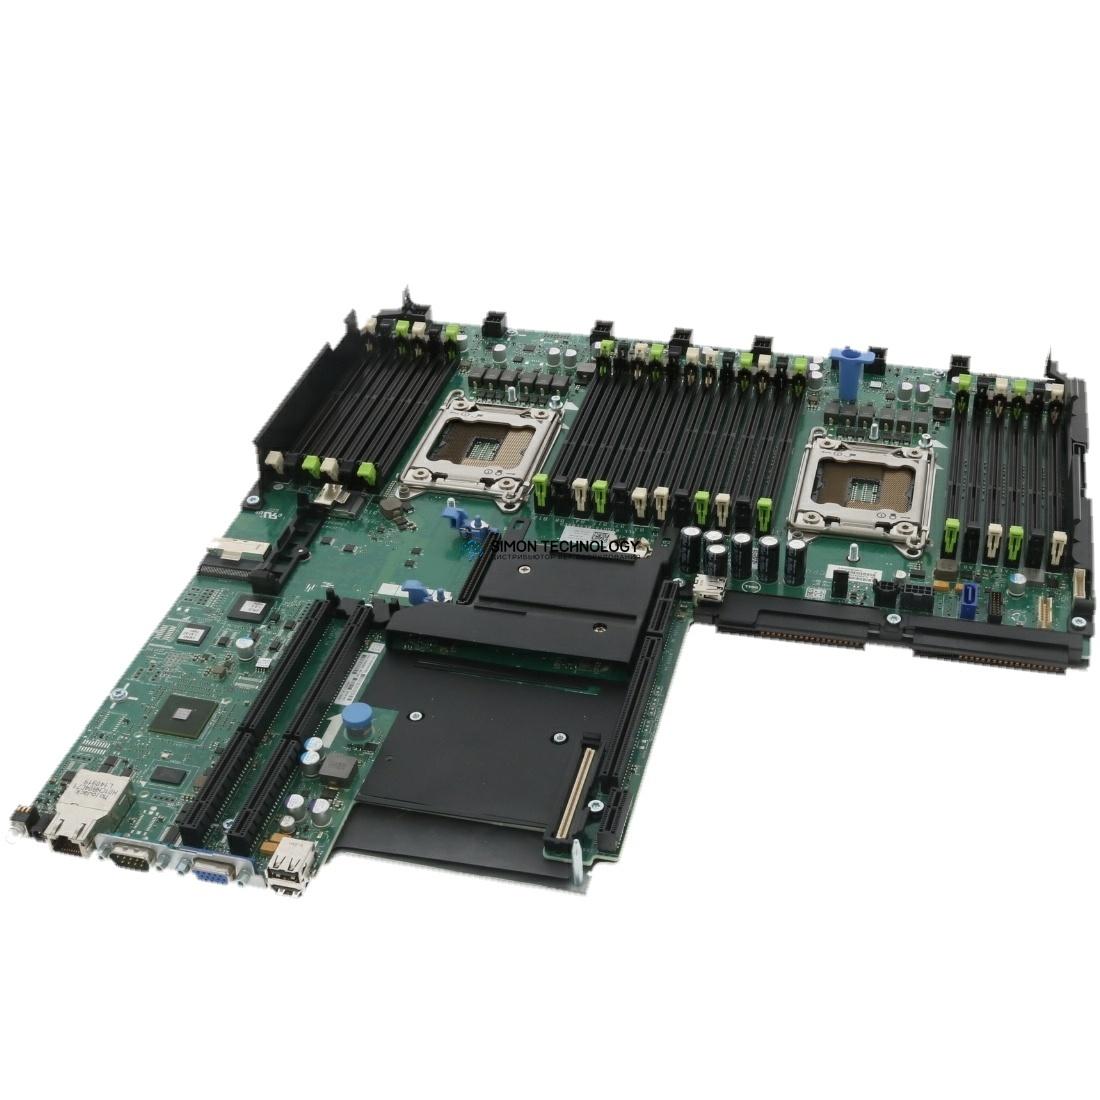 Материнская плата Dell PowerEdge R620 8 Bay VV3F2 Ask for custom qoute (PER620-SFF-8-VV3F2)